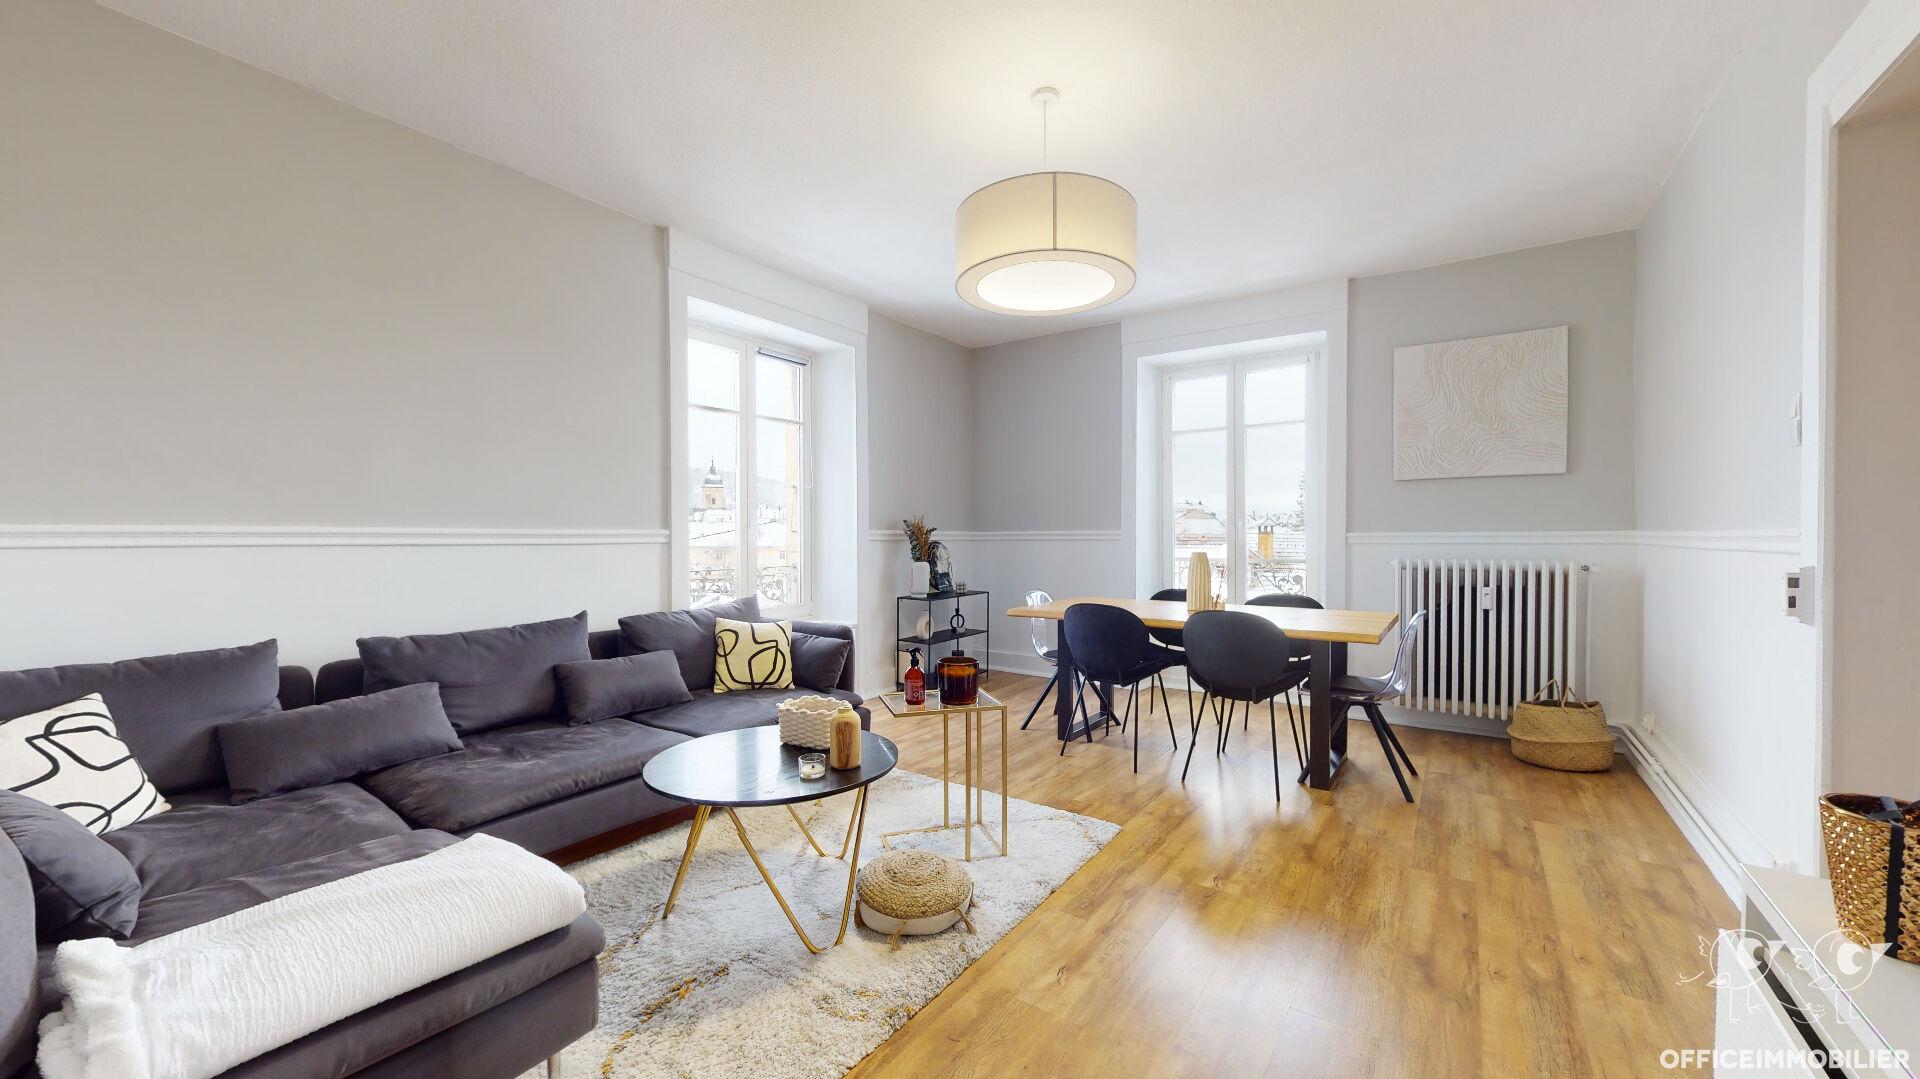 appartement 71m²  pontarlier  - photo 2